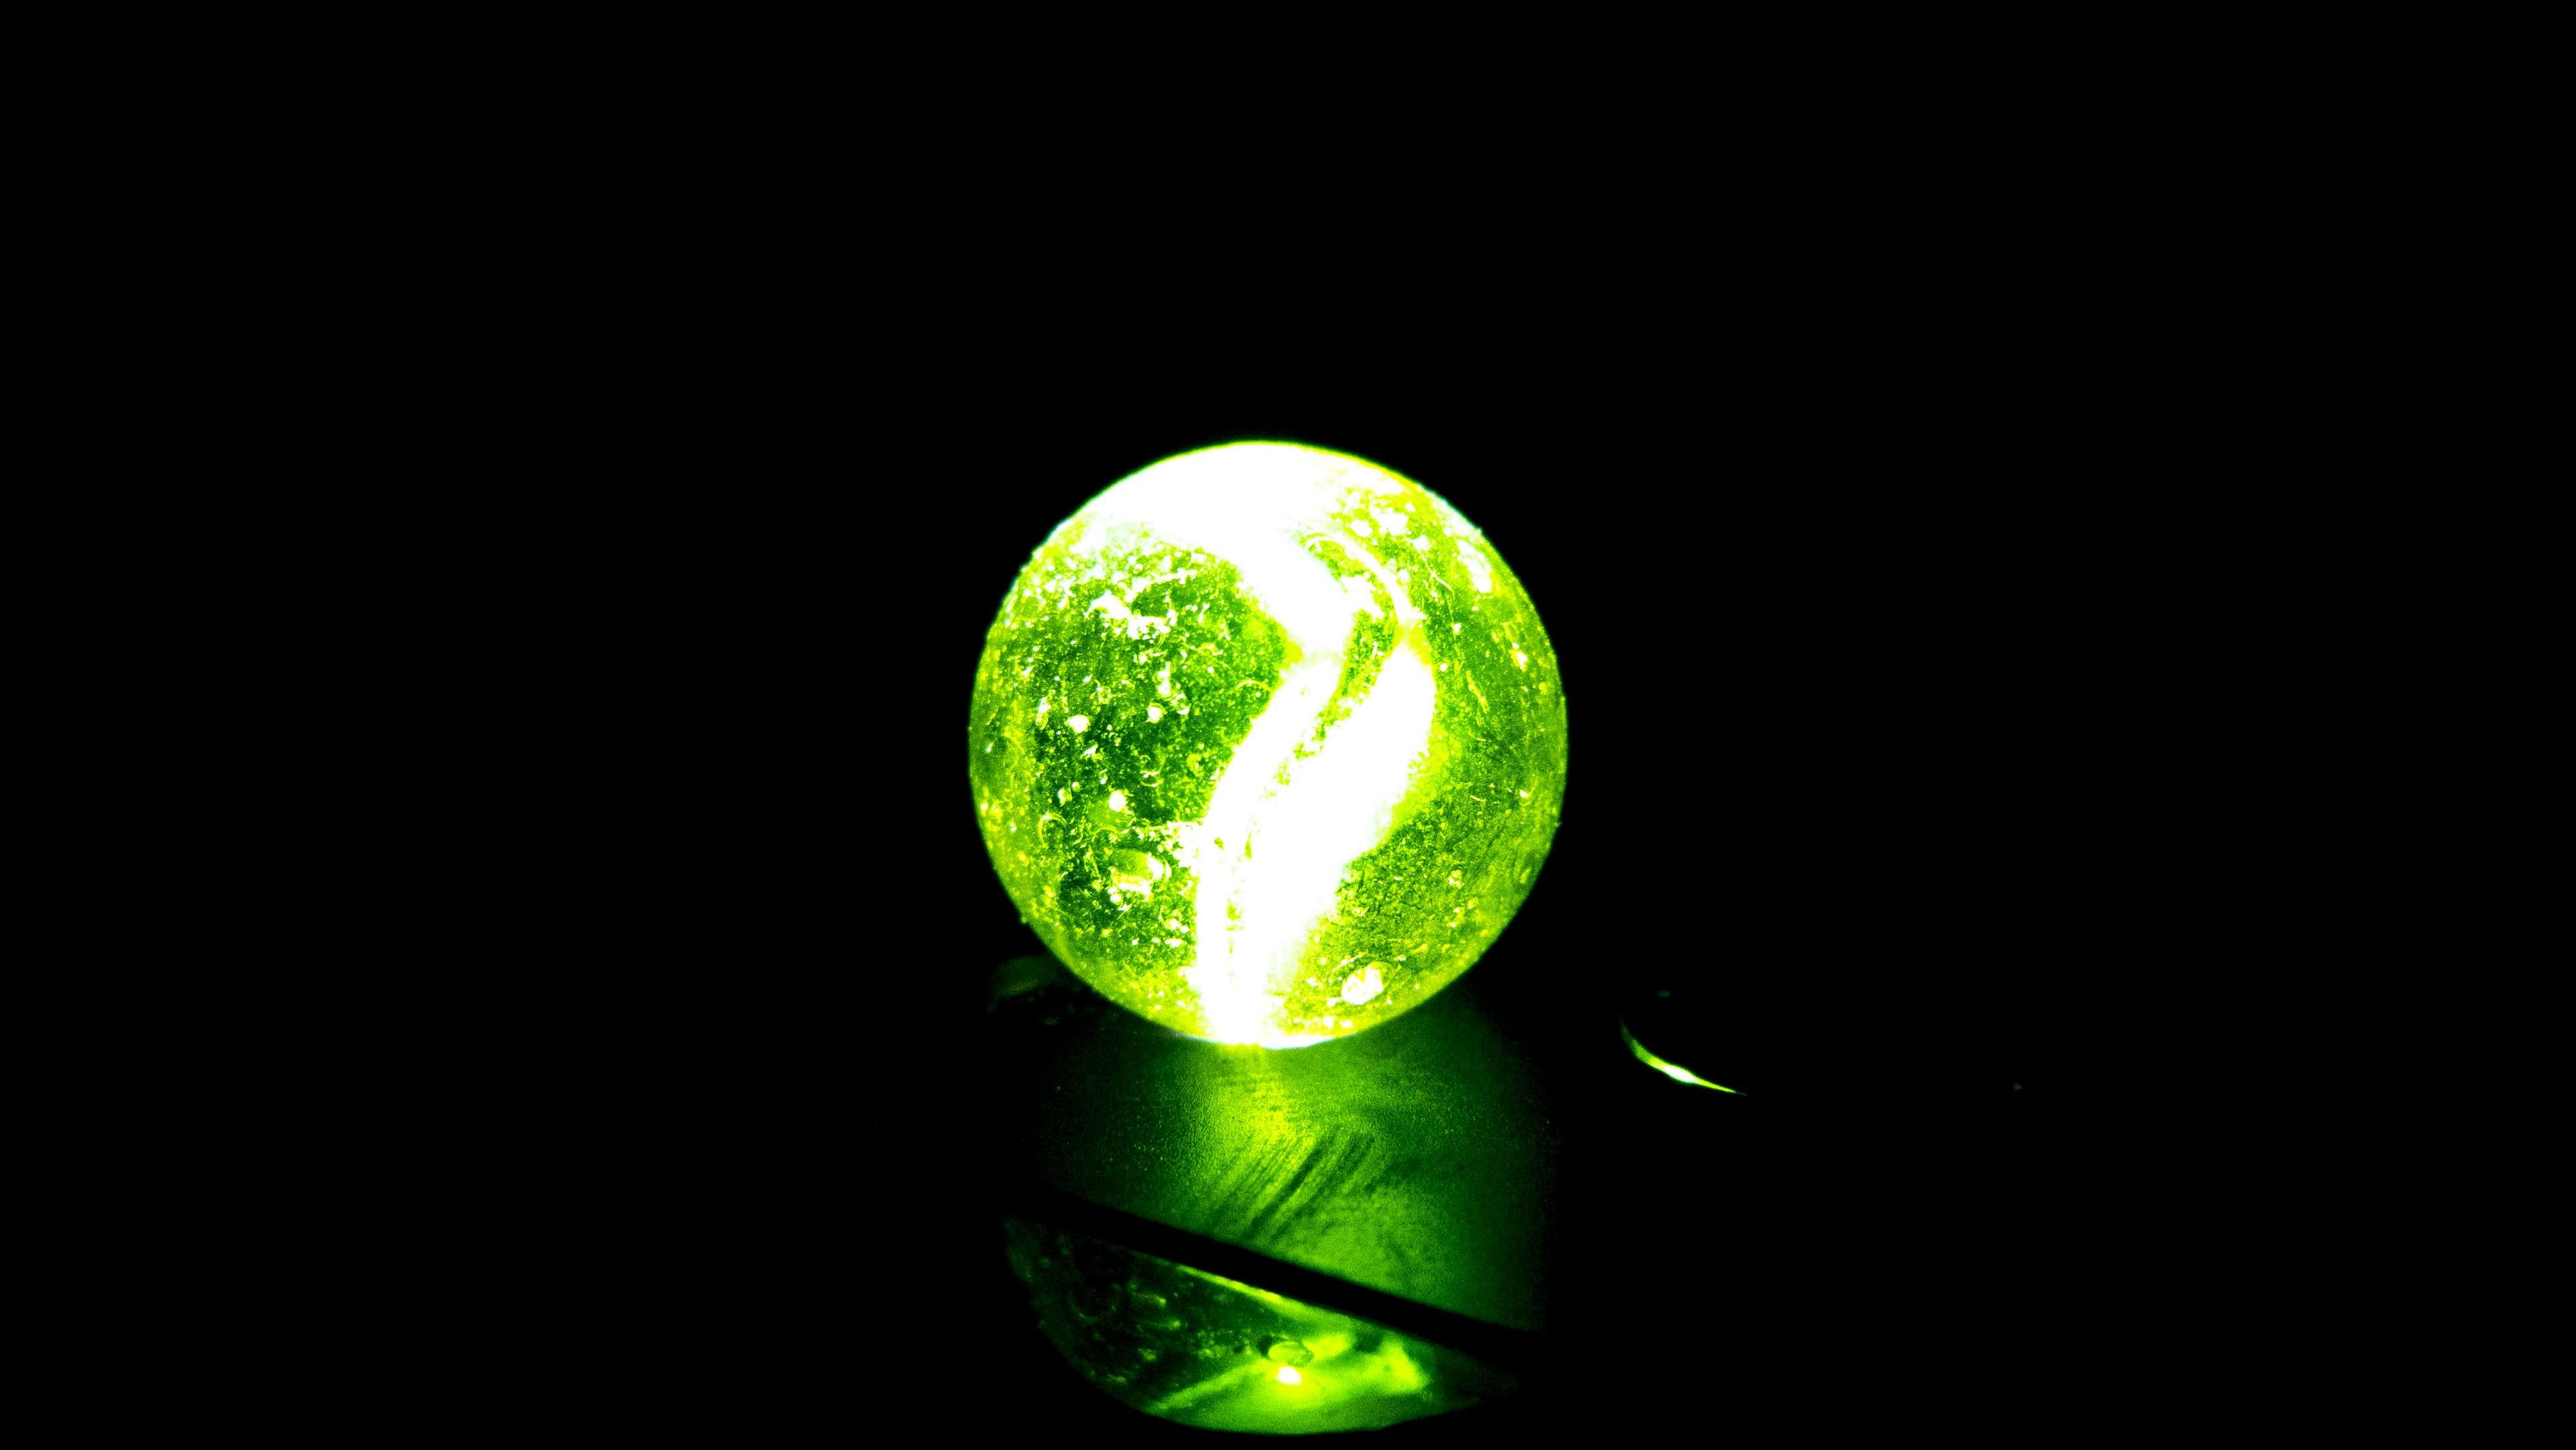 Ball Black Black And Green Burca Burquinha Dark Sphere